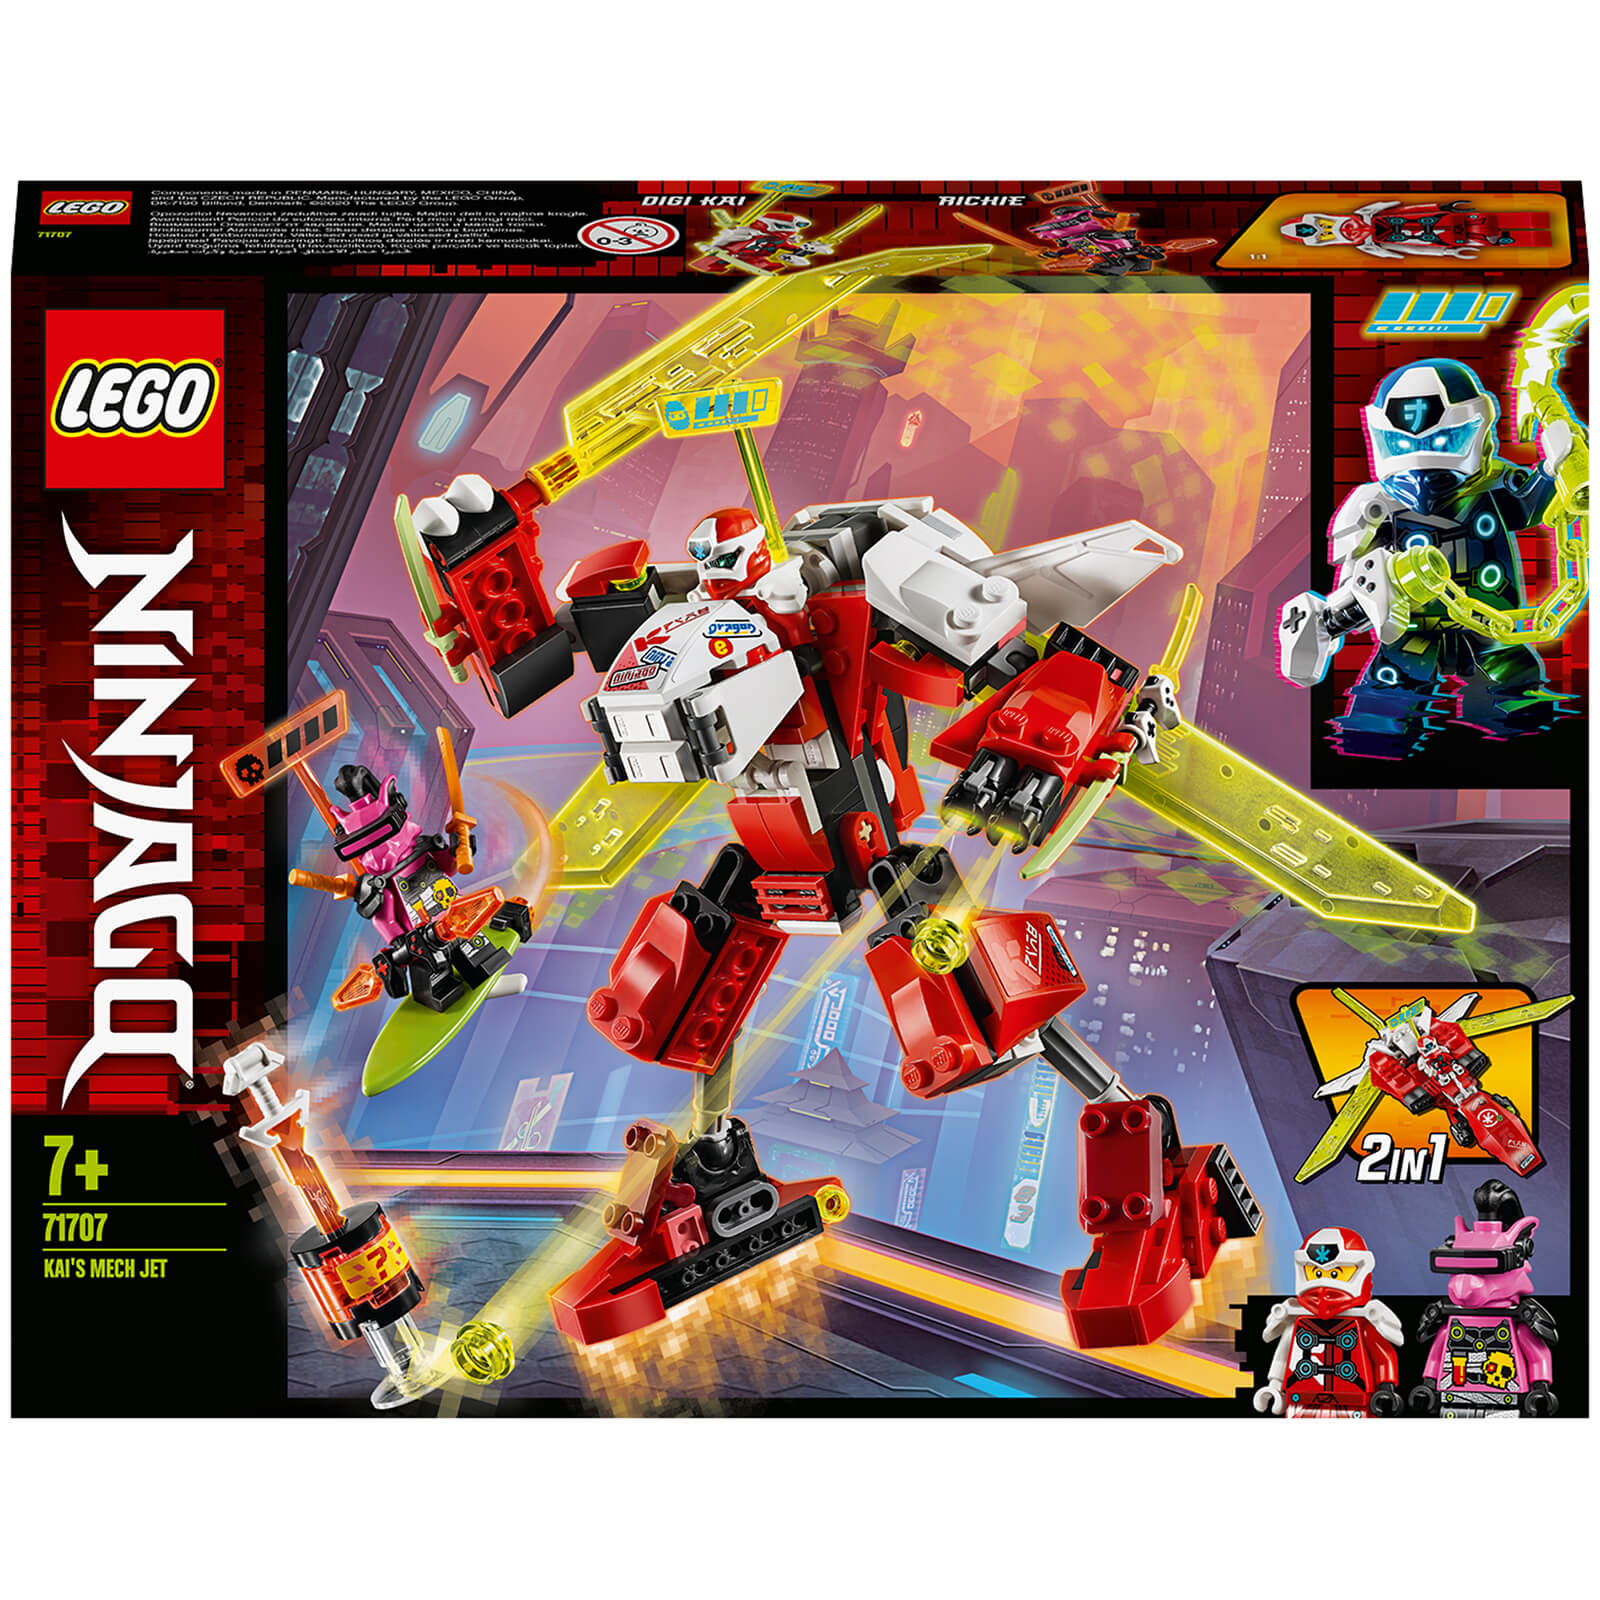 Image of 71707 LEGO® NINJAGO Kais Mech Jet